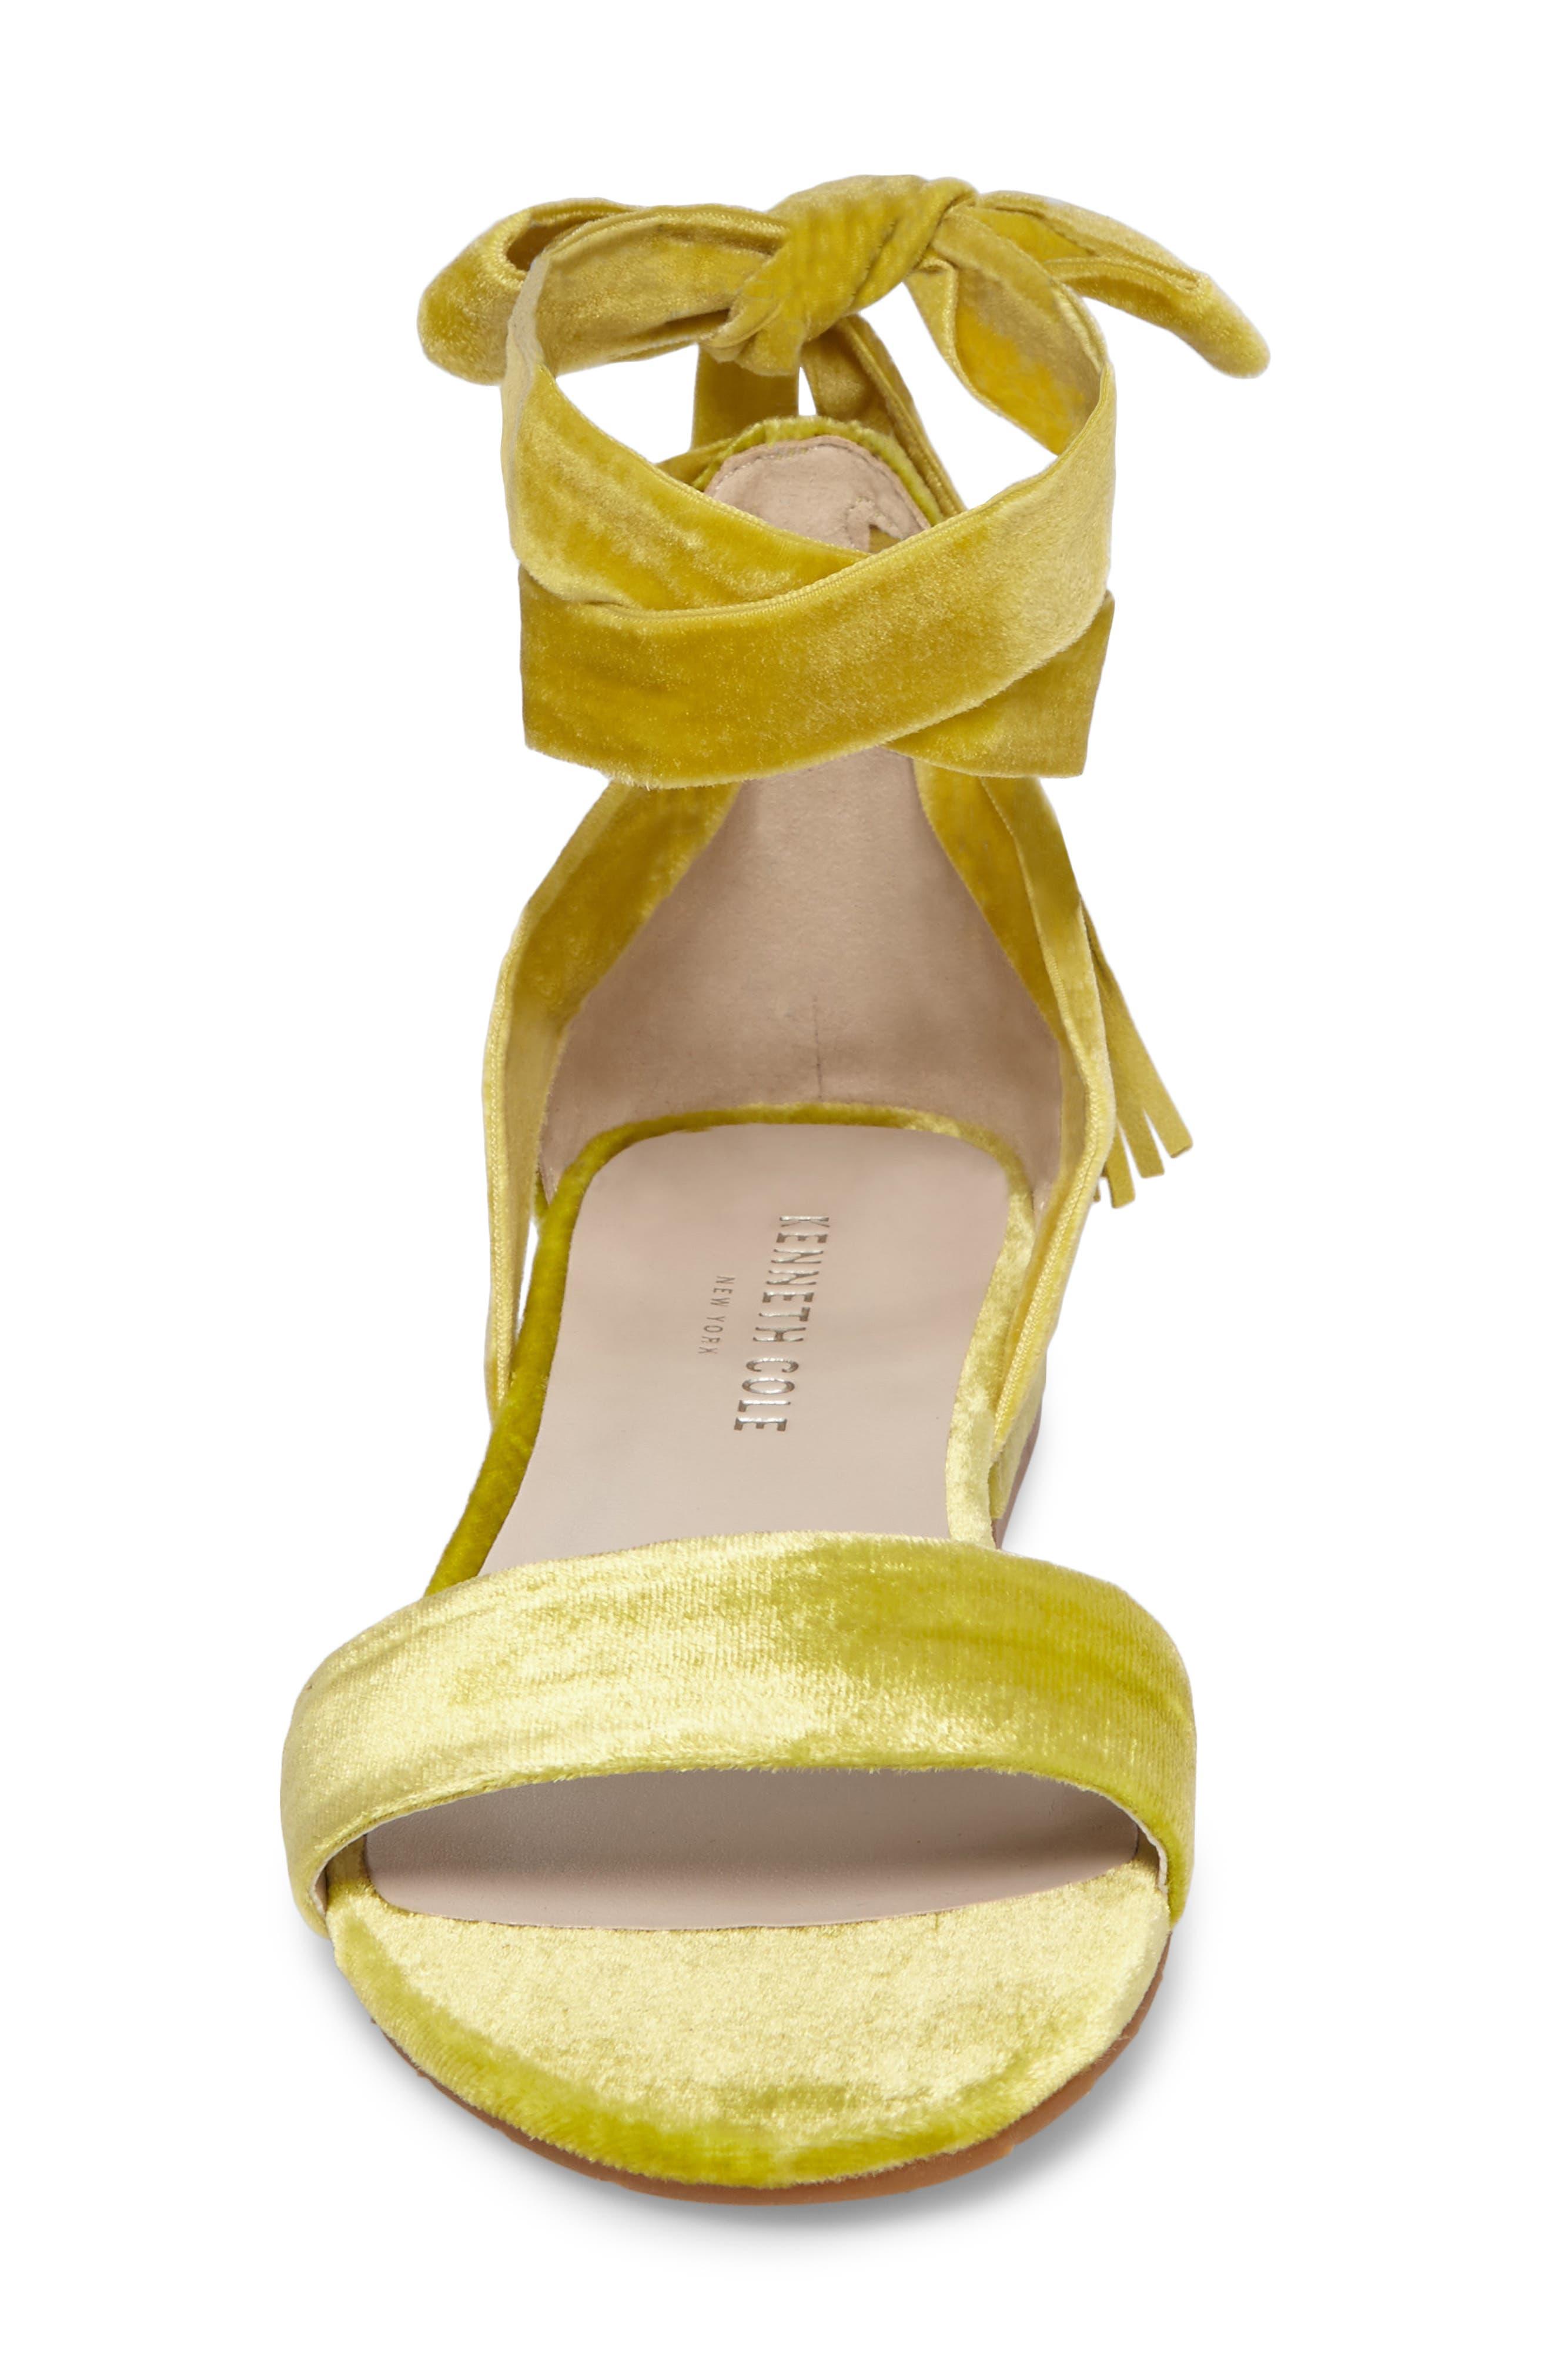 Valen Tassel Lace-Up Sandal,                             Alternate thumbnail 49, color,